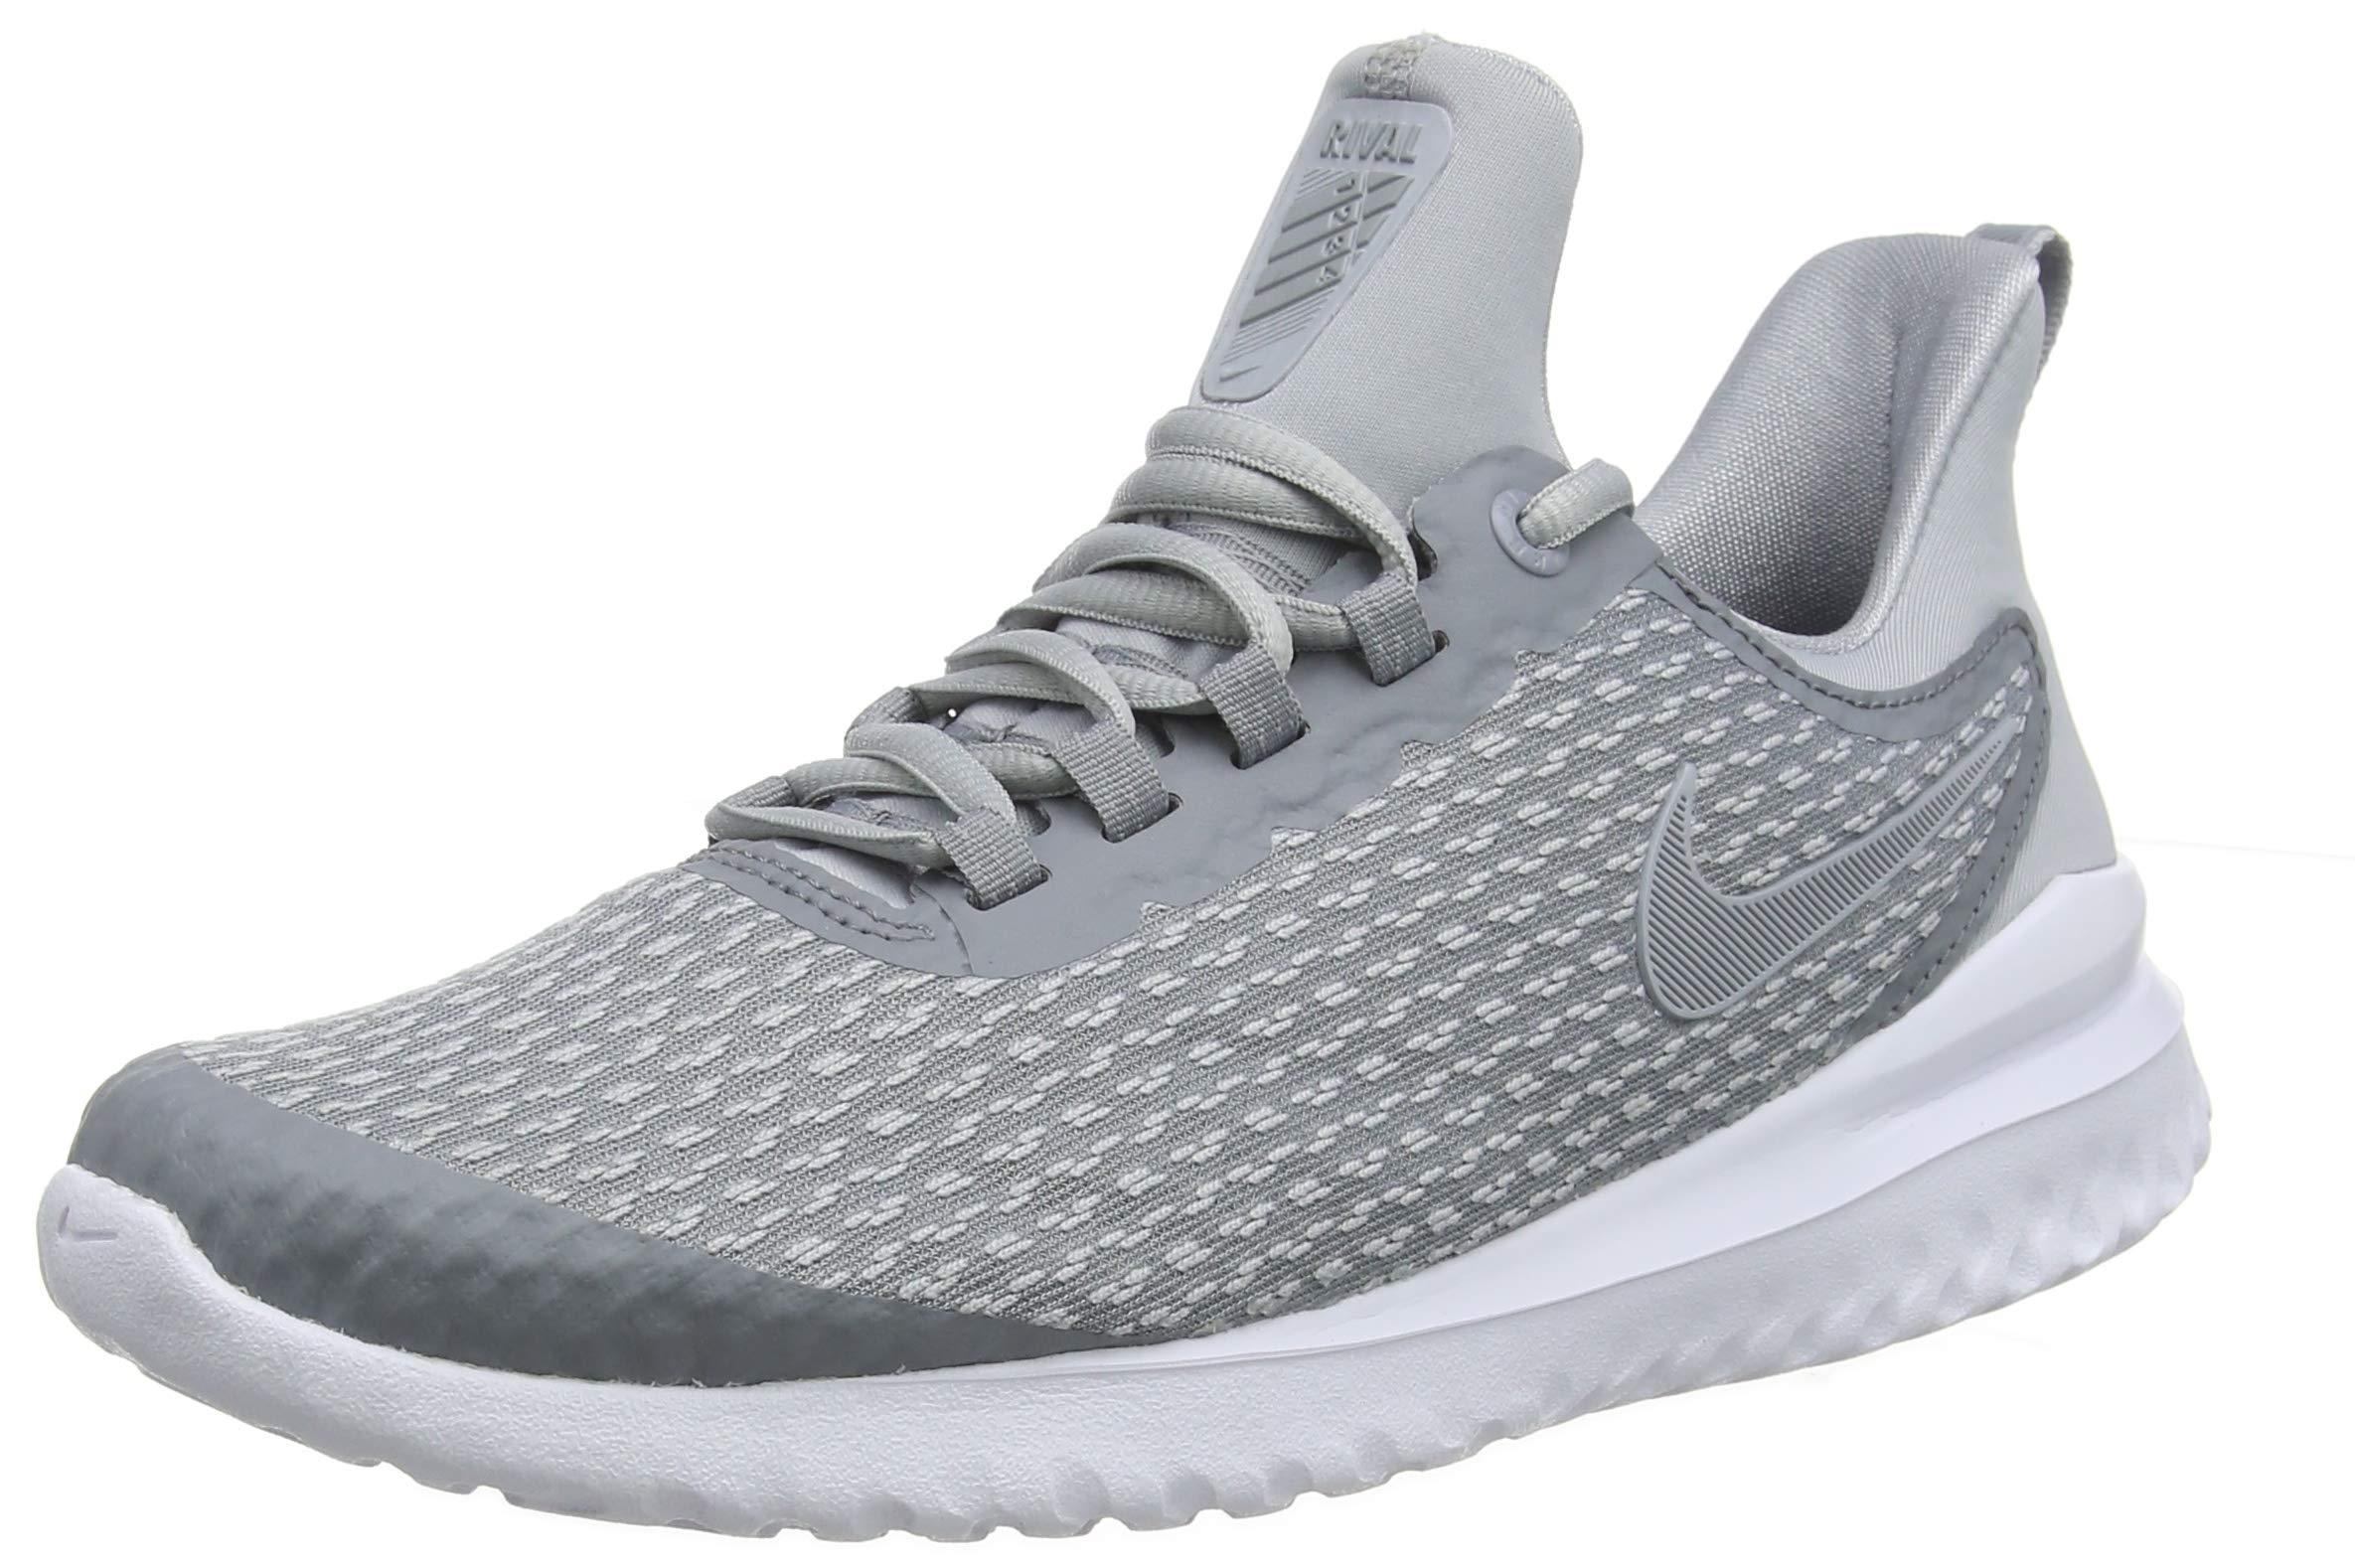 Nike white Basses 00140 Blue RivalSneakers Eu HommeMulticoloresquadron Renew EH29DWIbeY